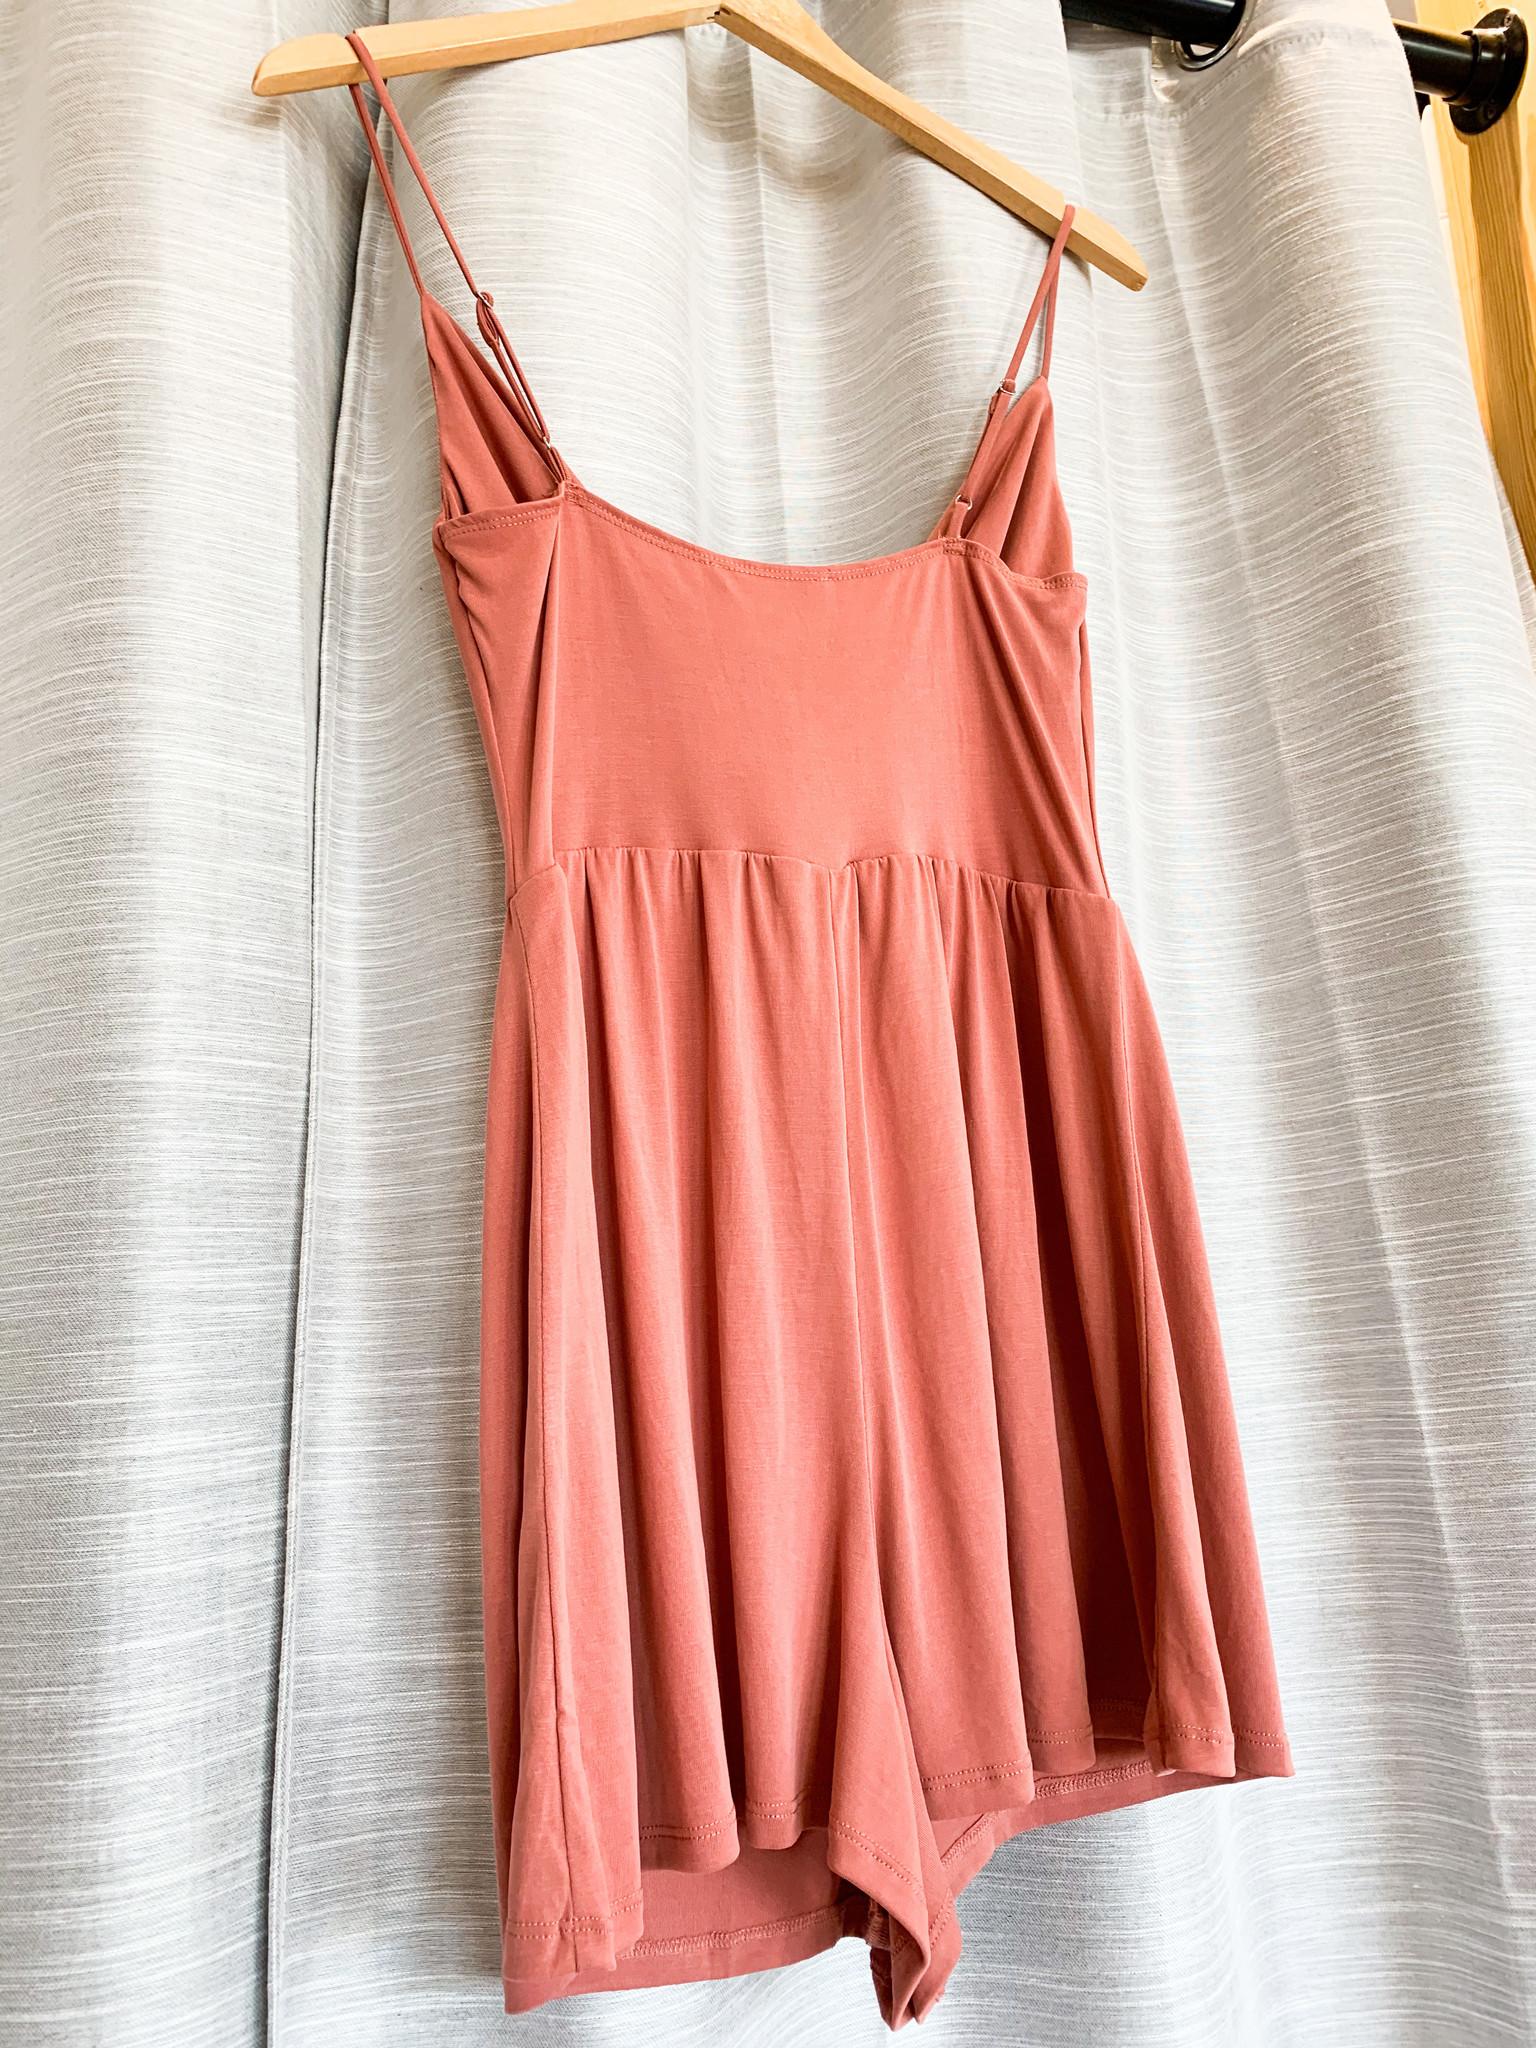 Terracotta Knit Solid Romper